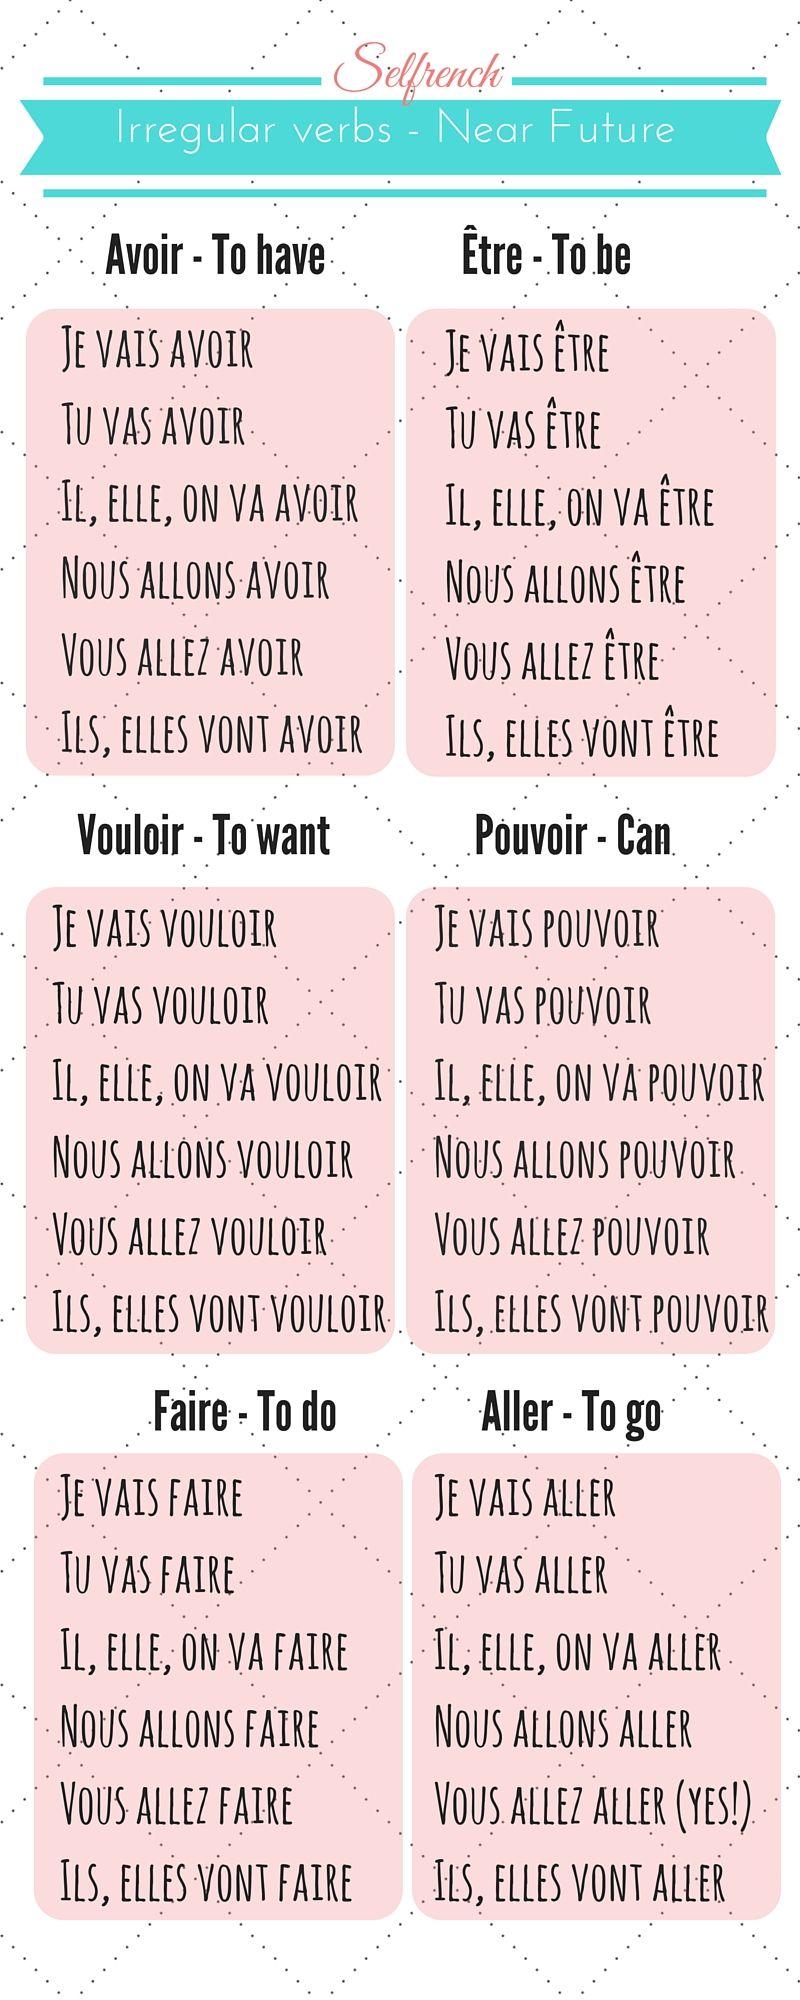 Learn French online | Lingoda - Online Language School ...